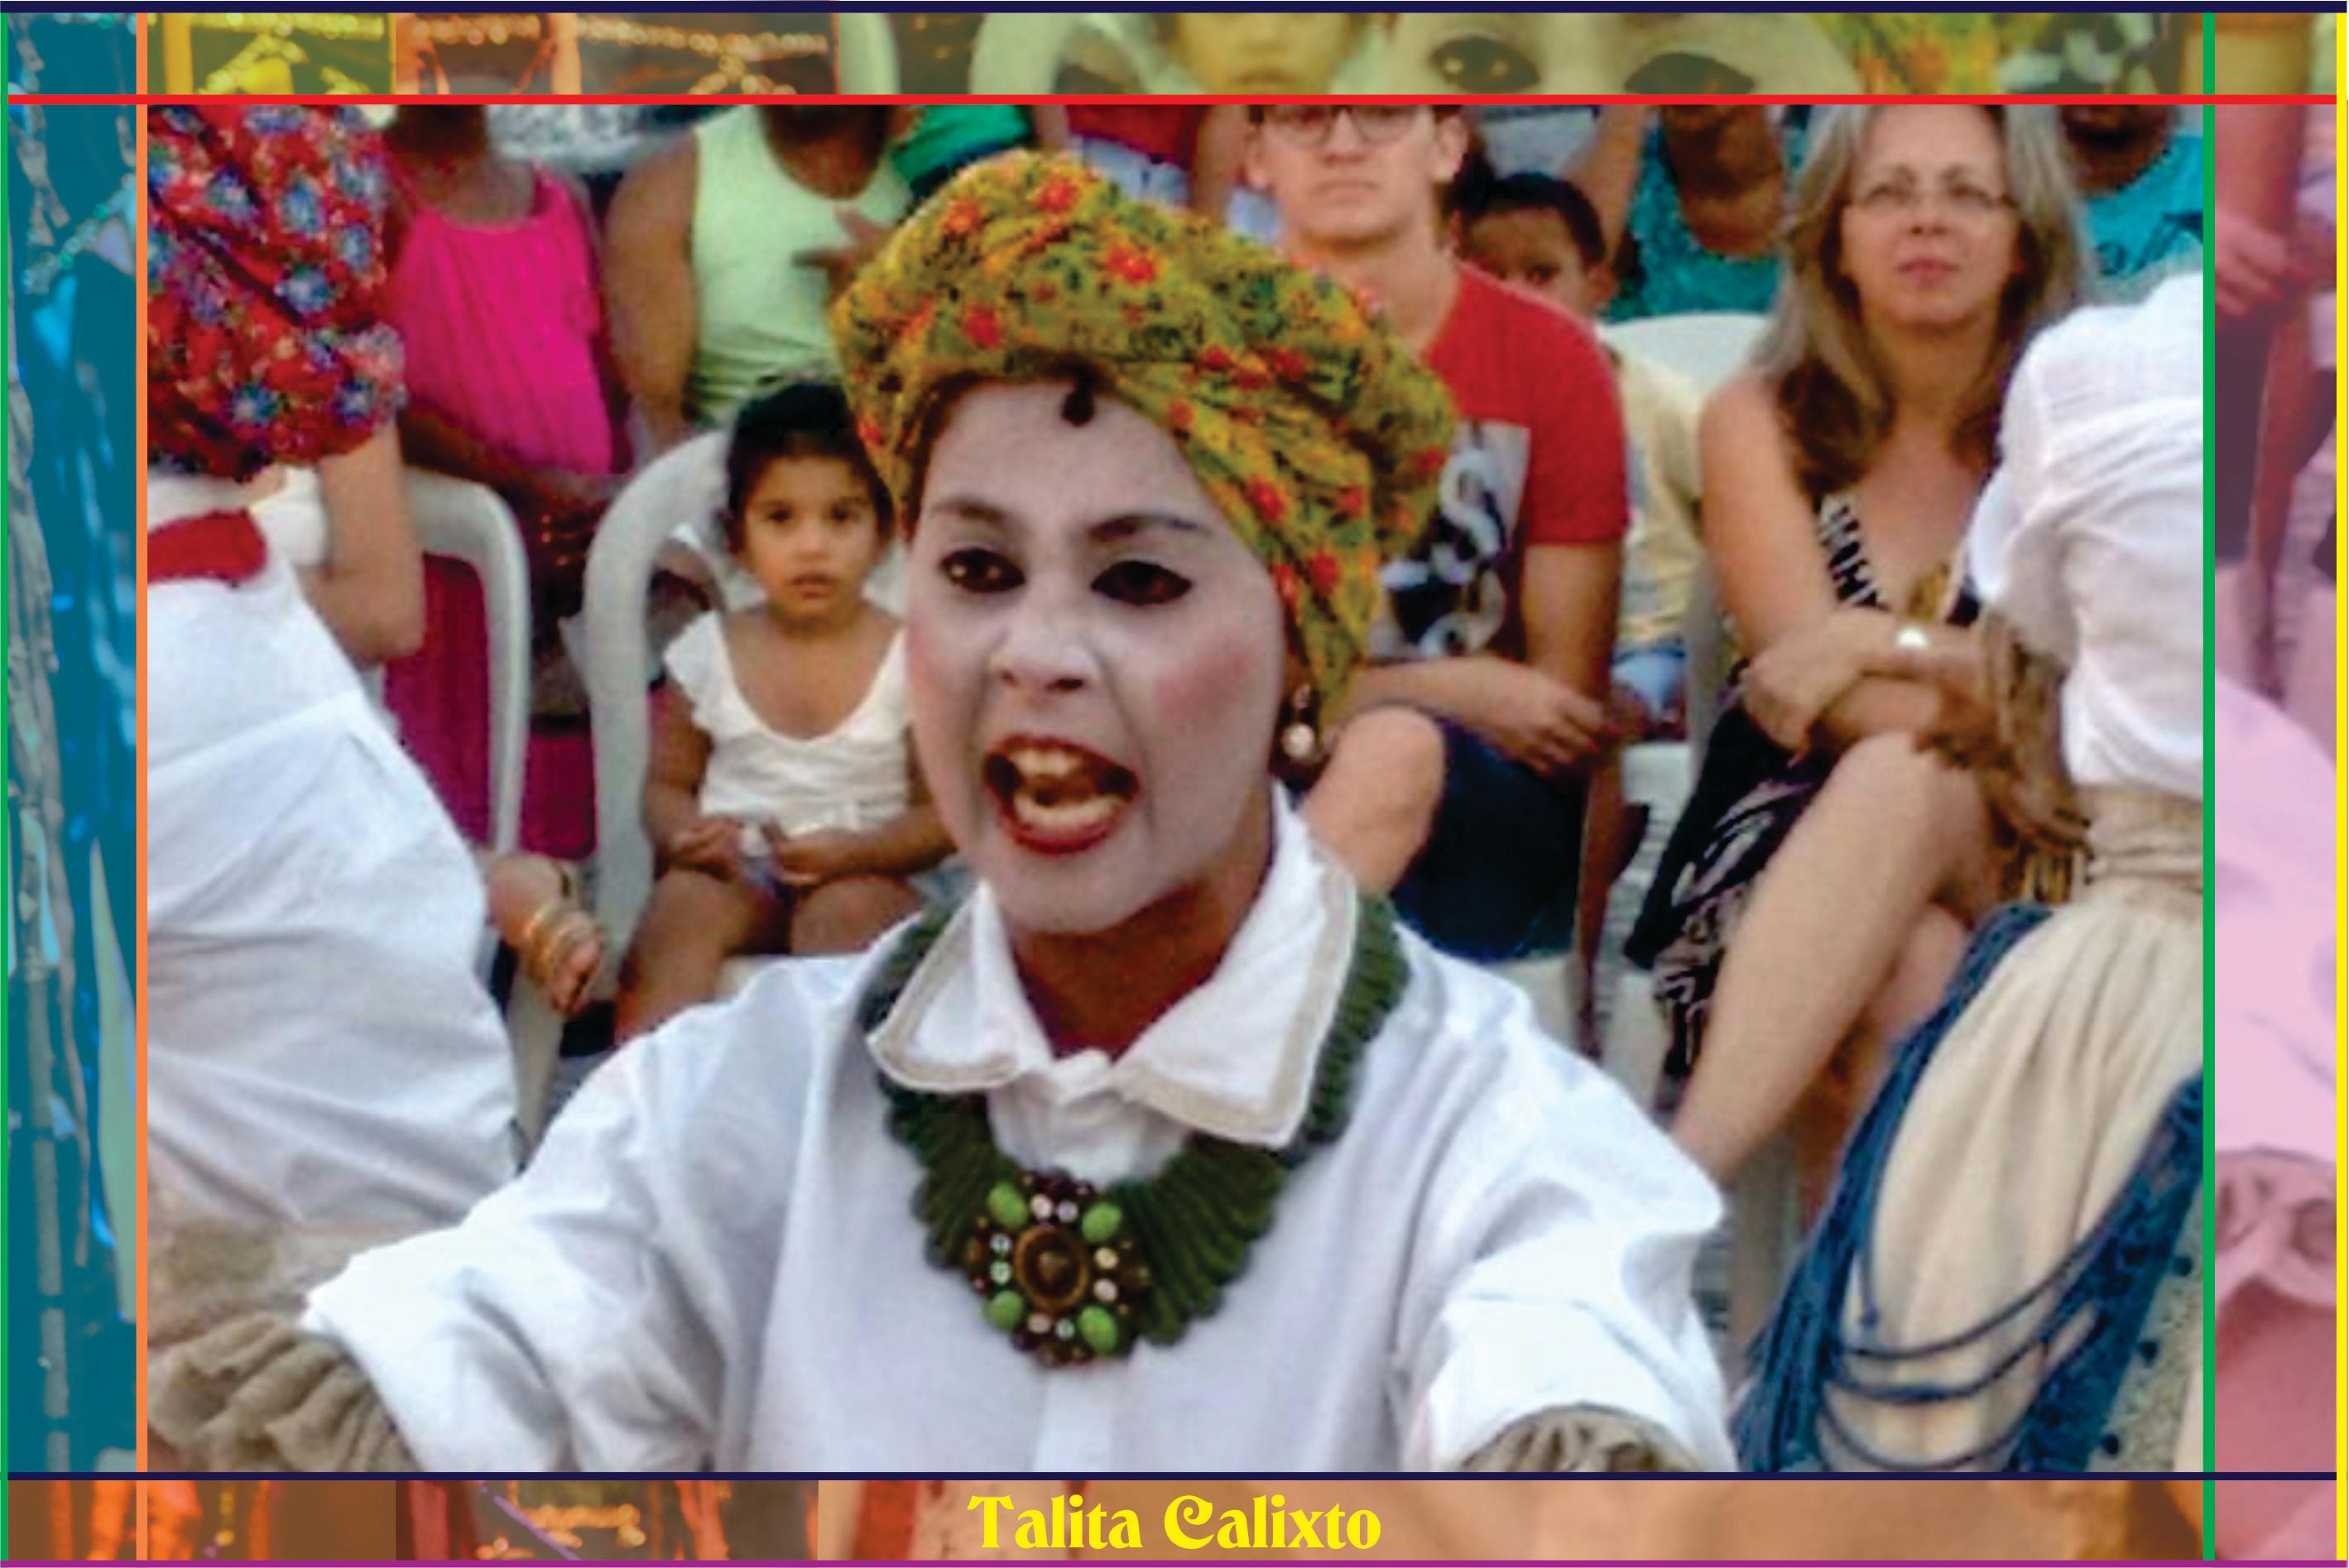 Talita Calixto